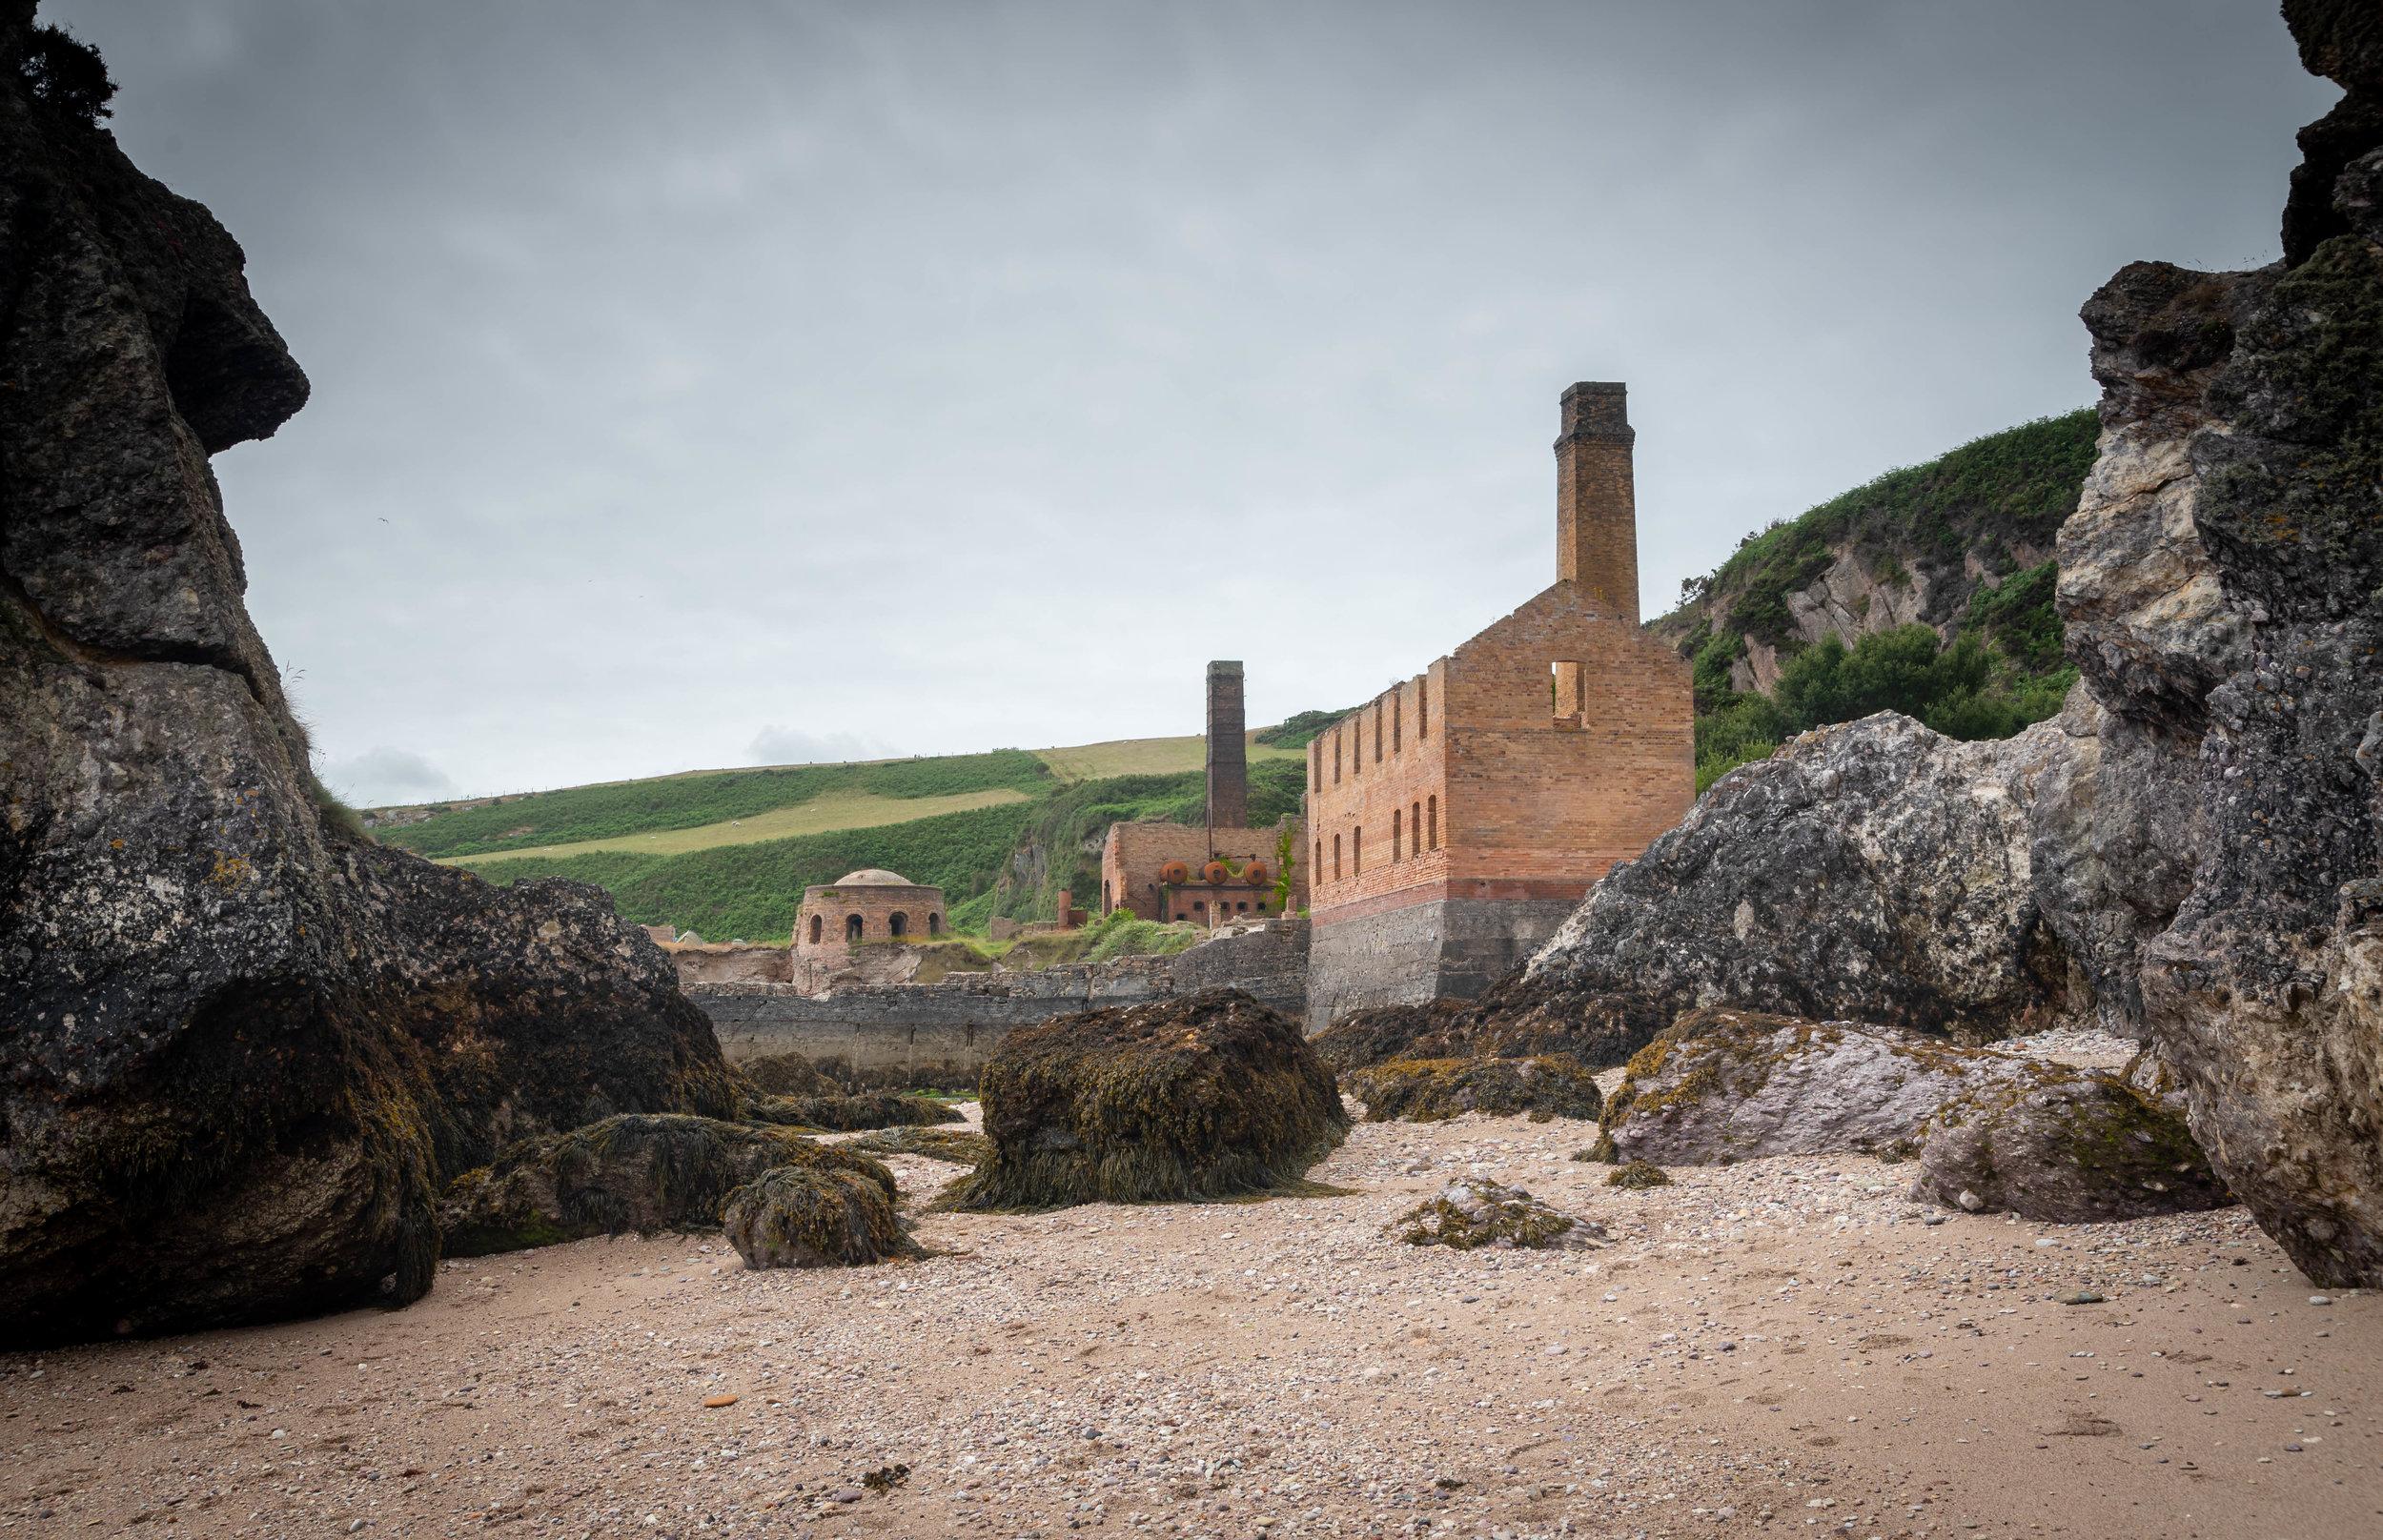 Porth Wen Brickworks, Anglesey